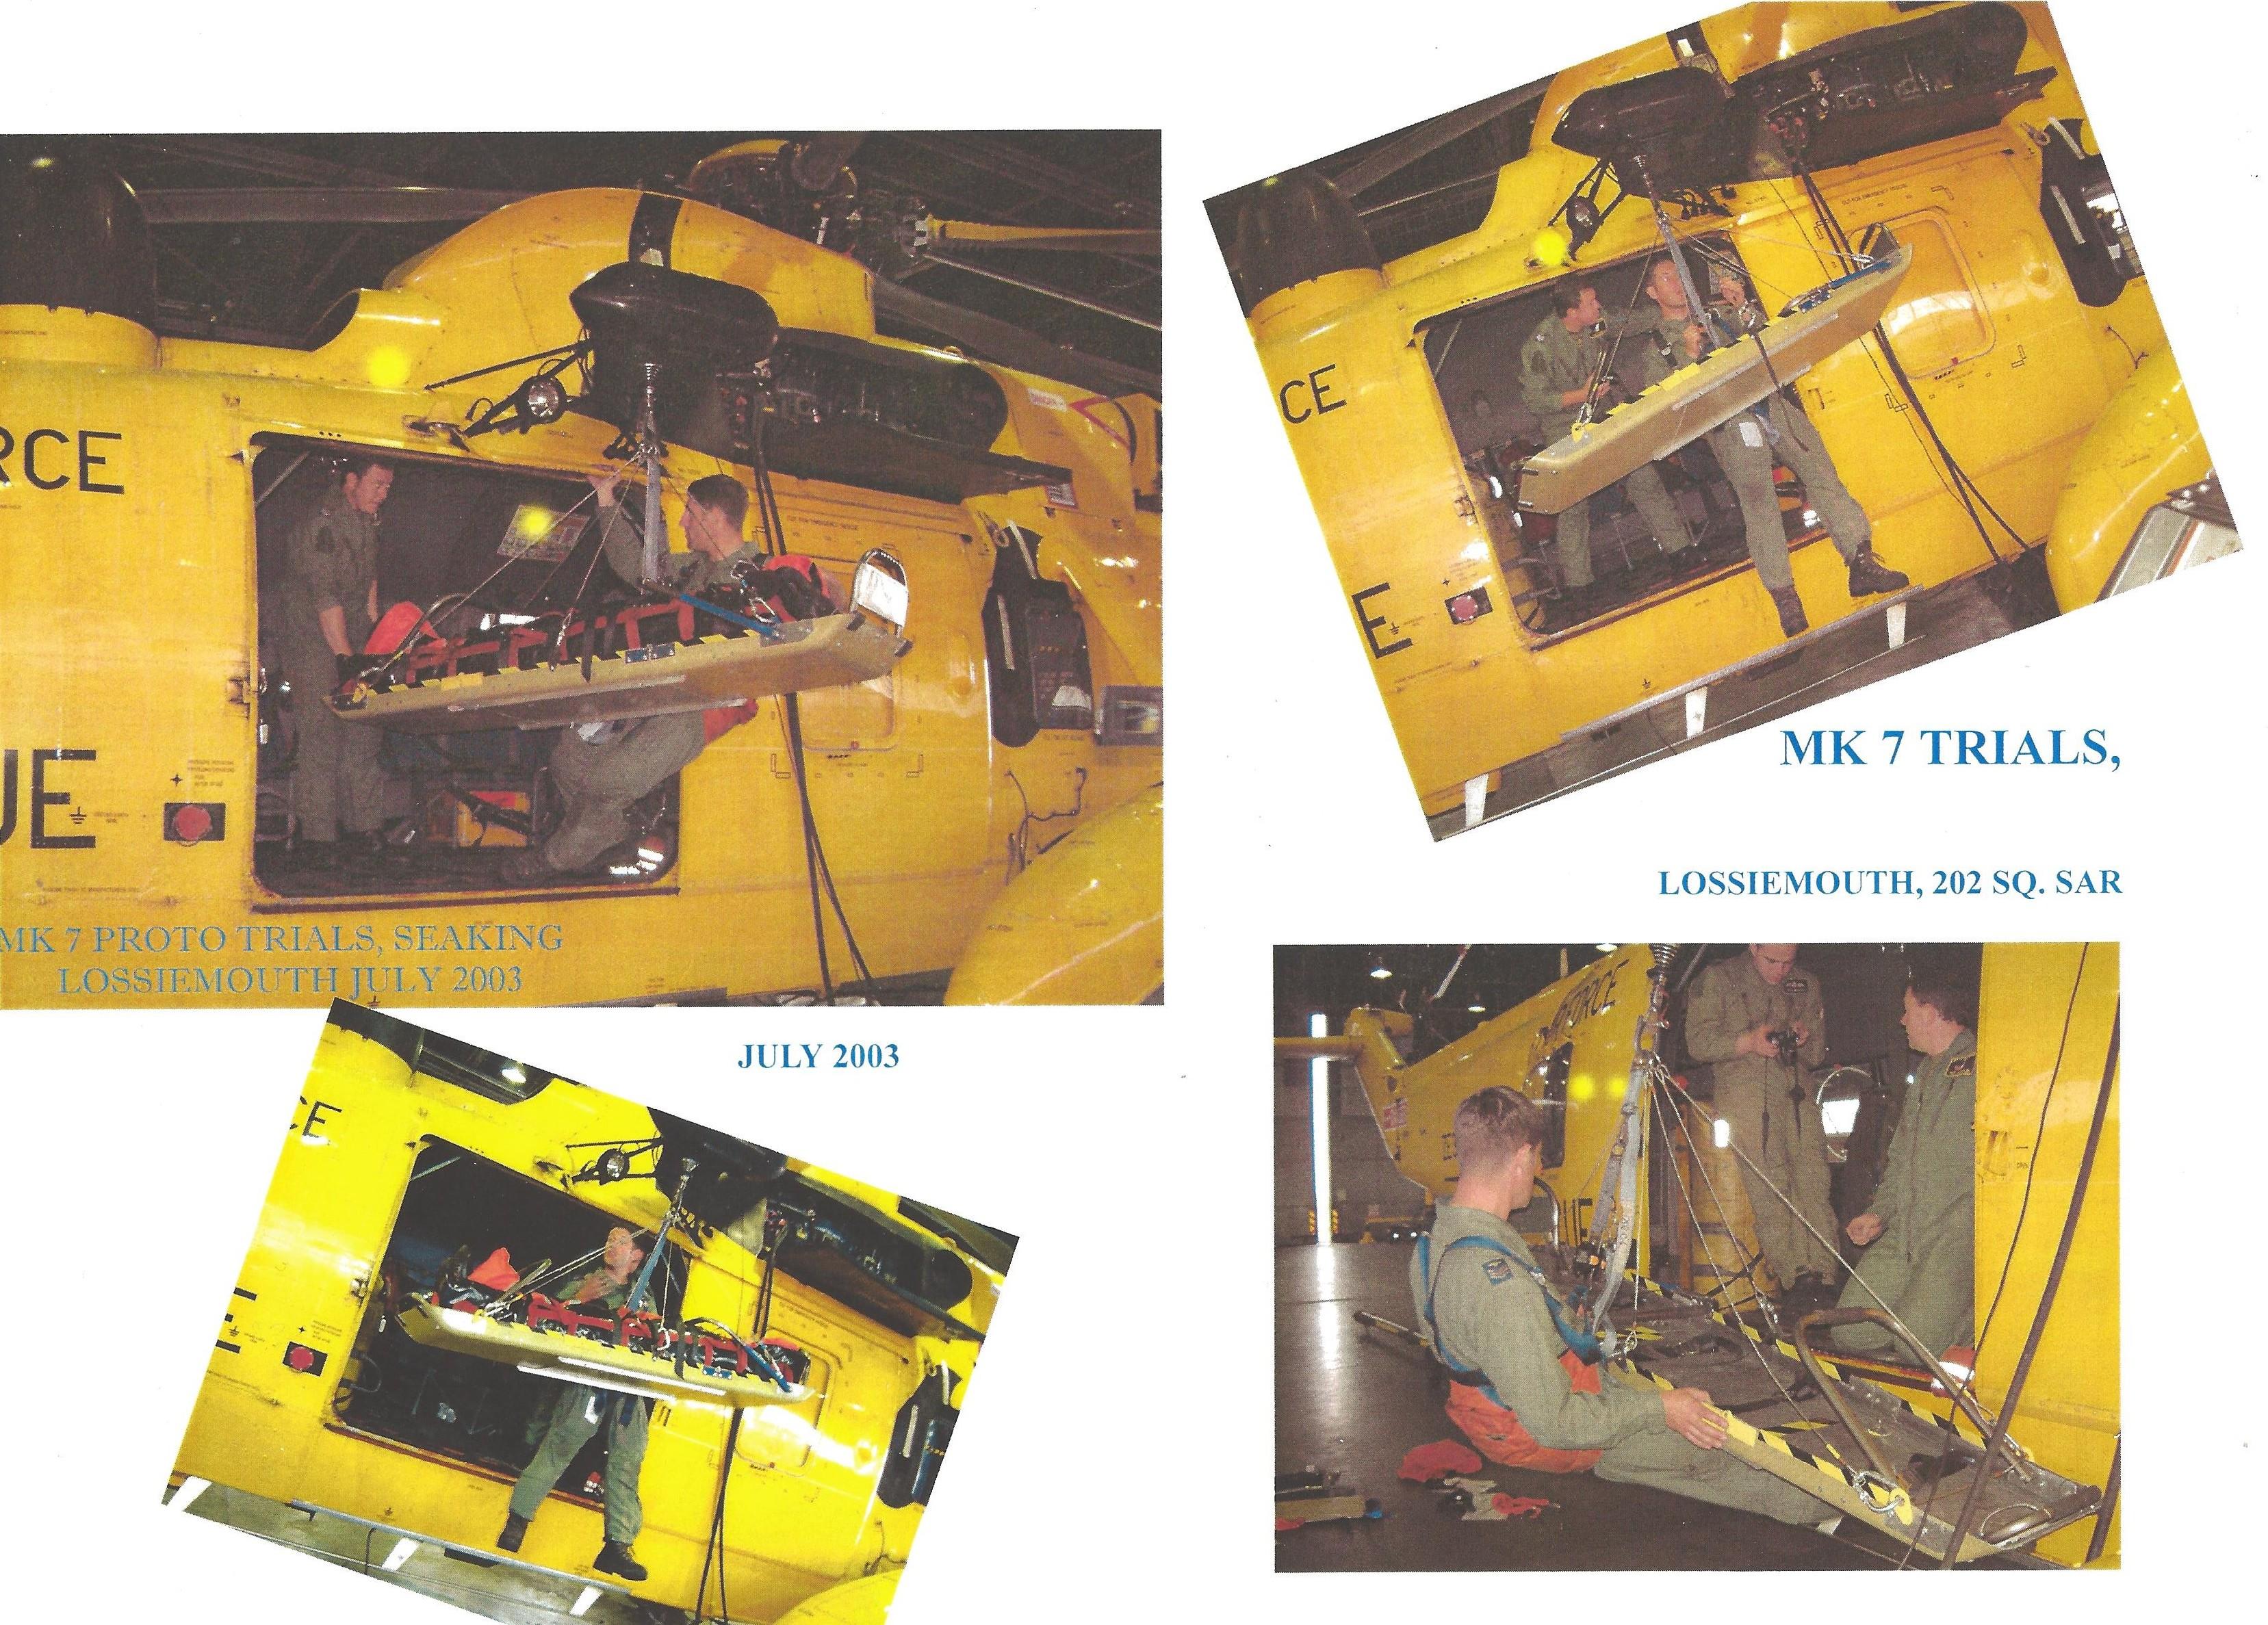 MacInnesMk7 RAF test 2003